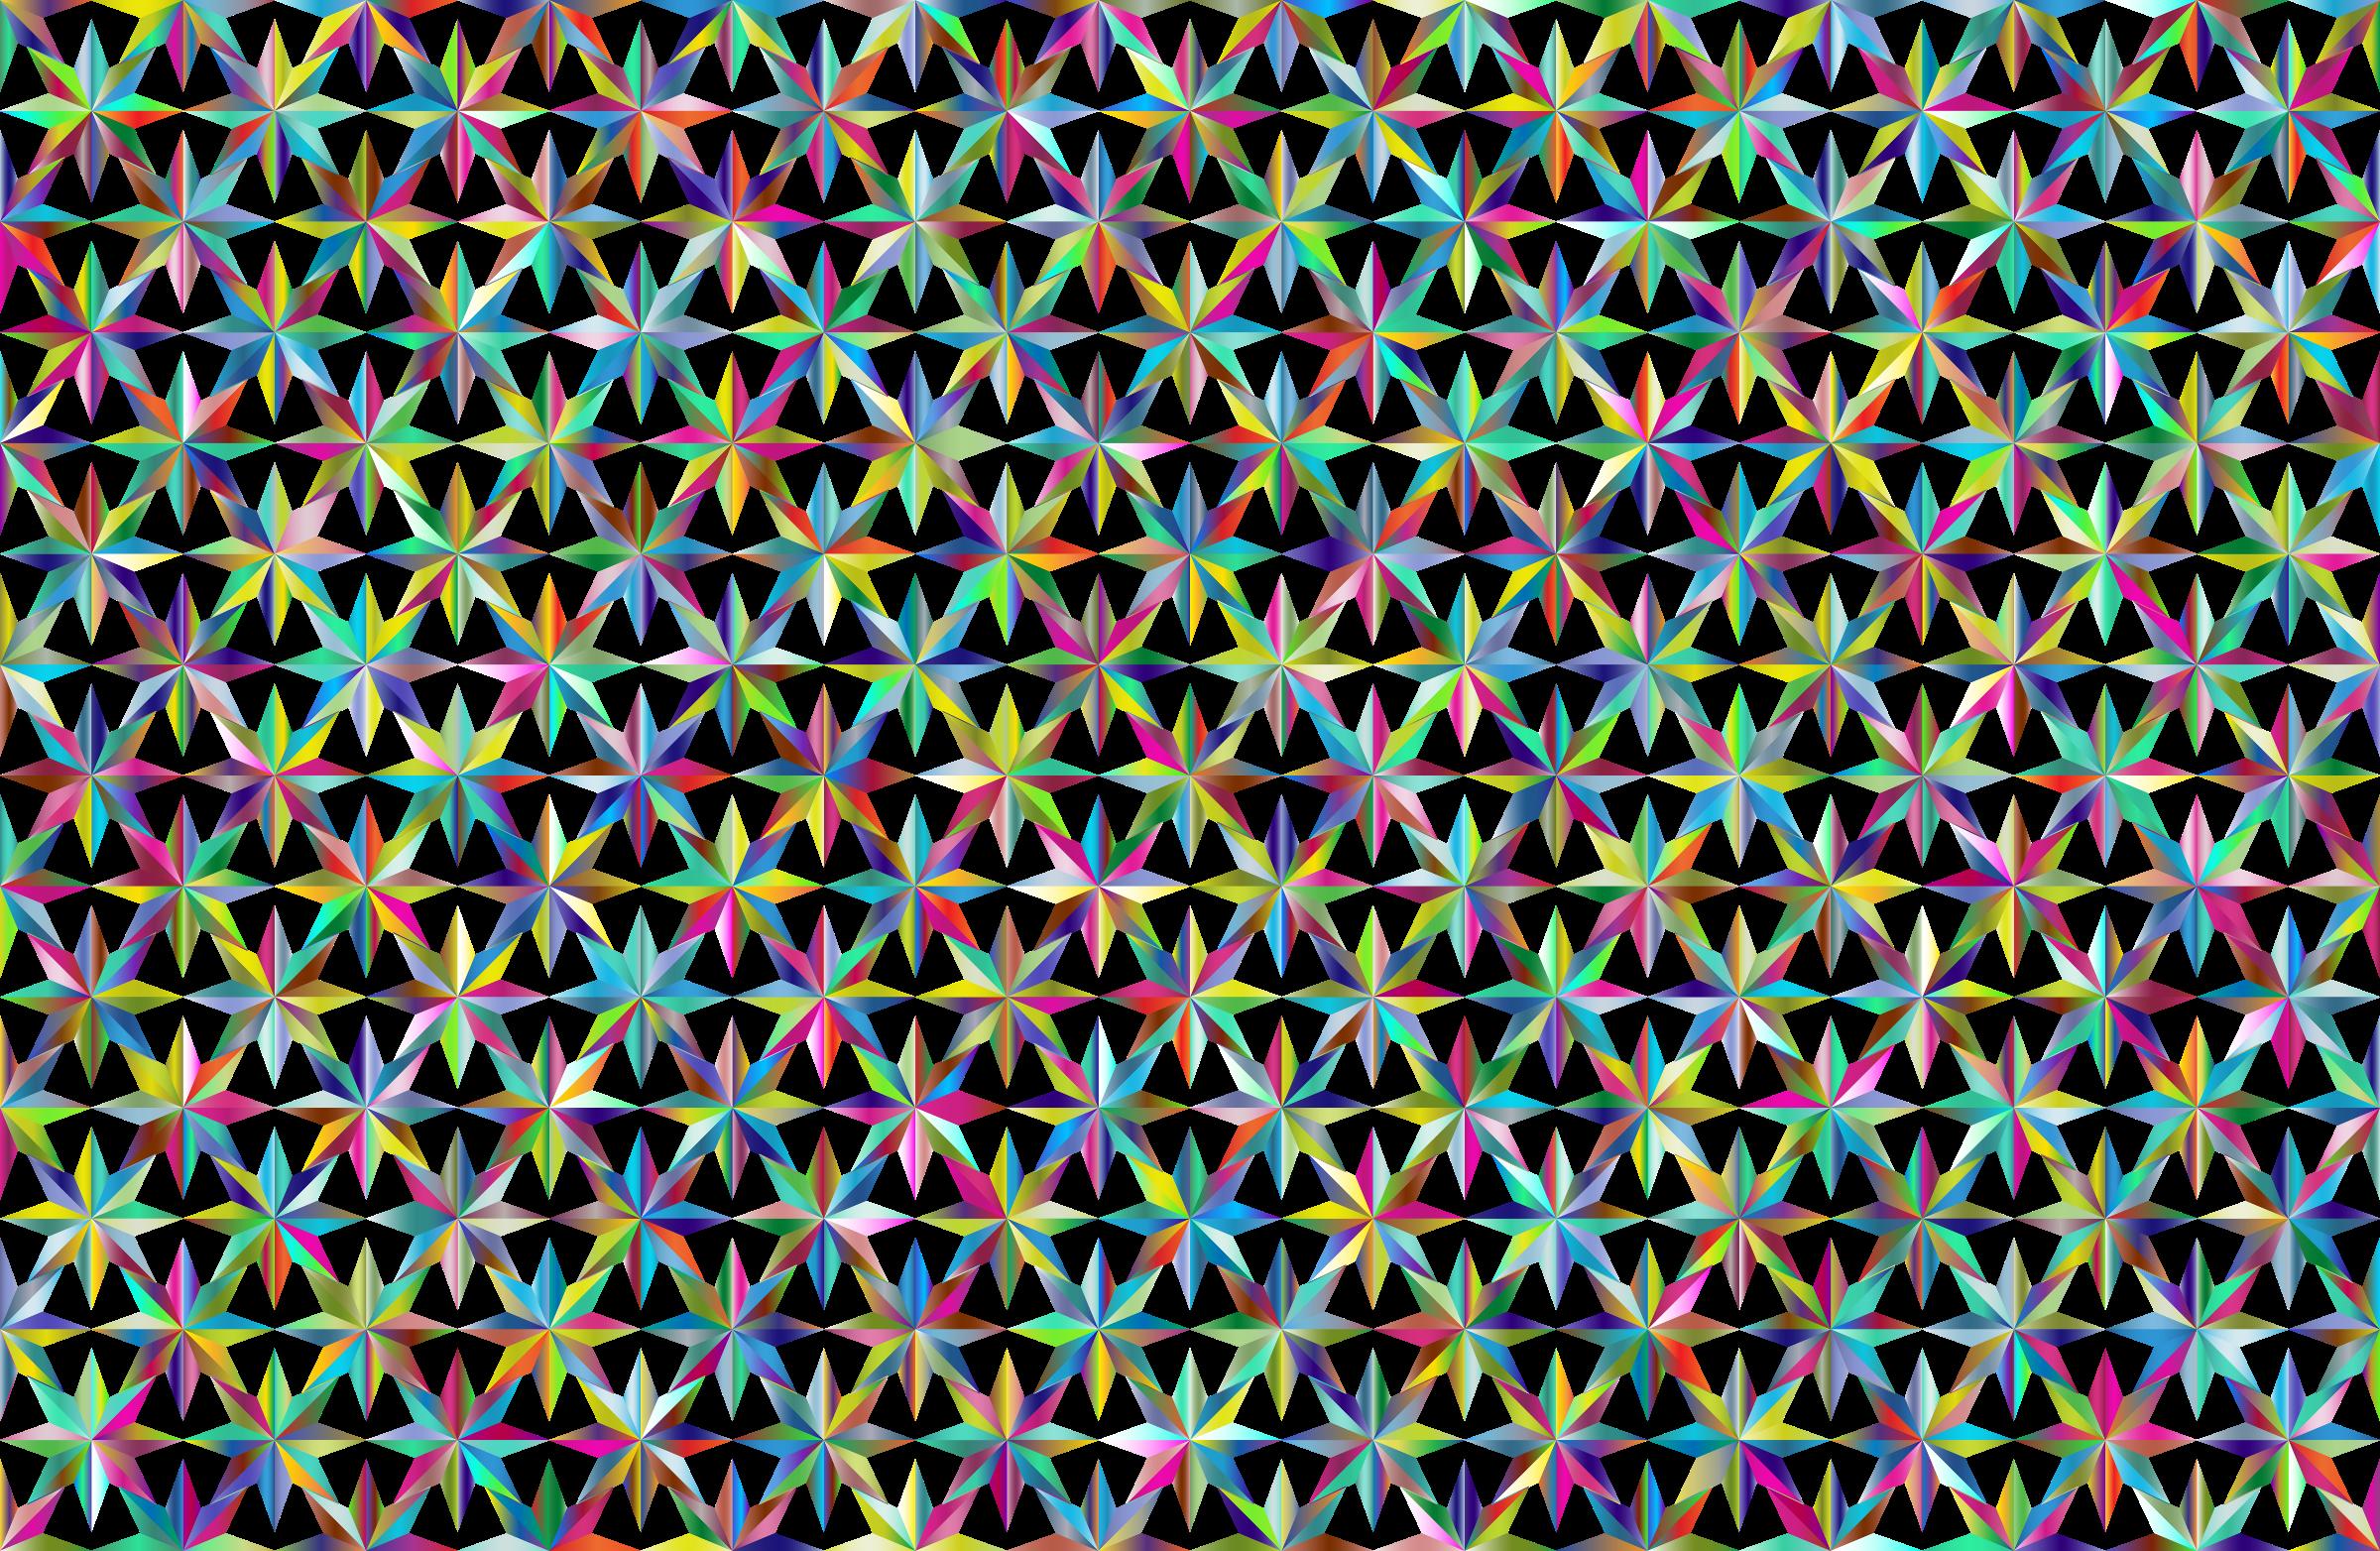 Louis Vuitton Wallpaper Hd PNG Image